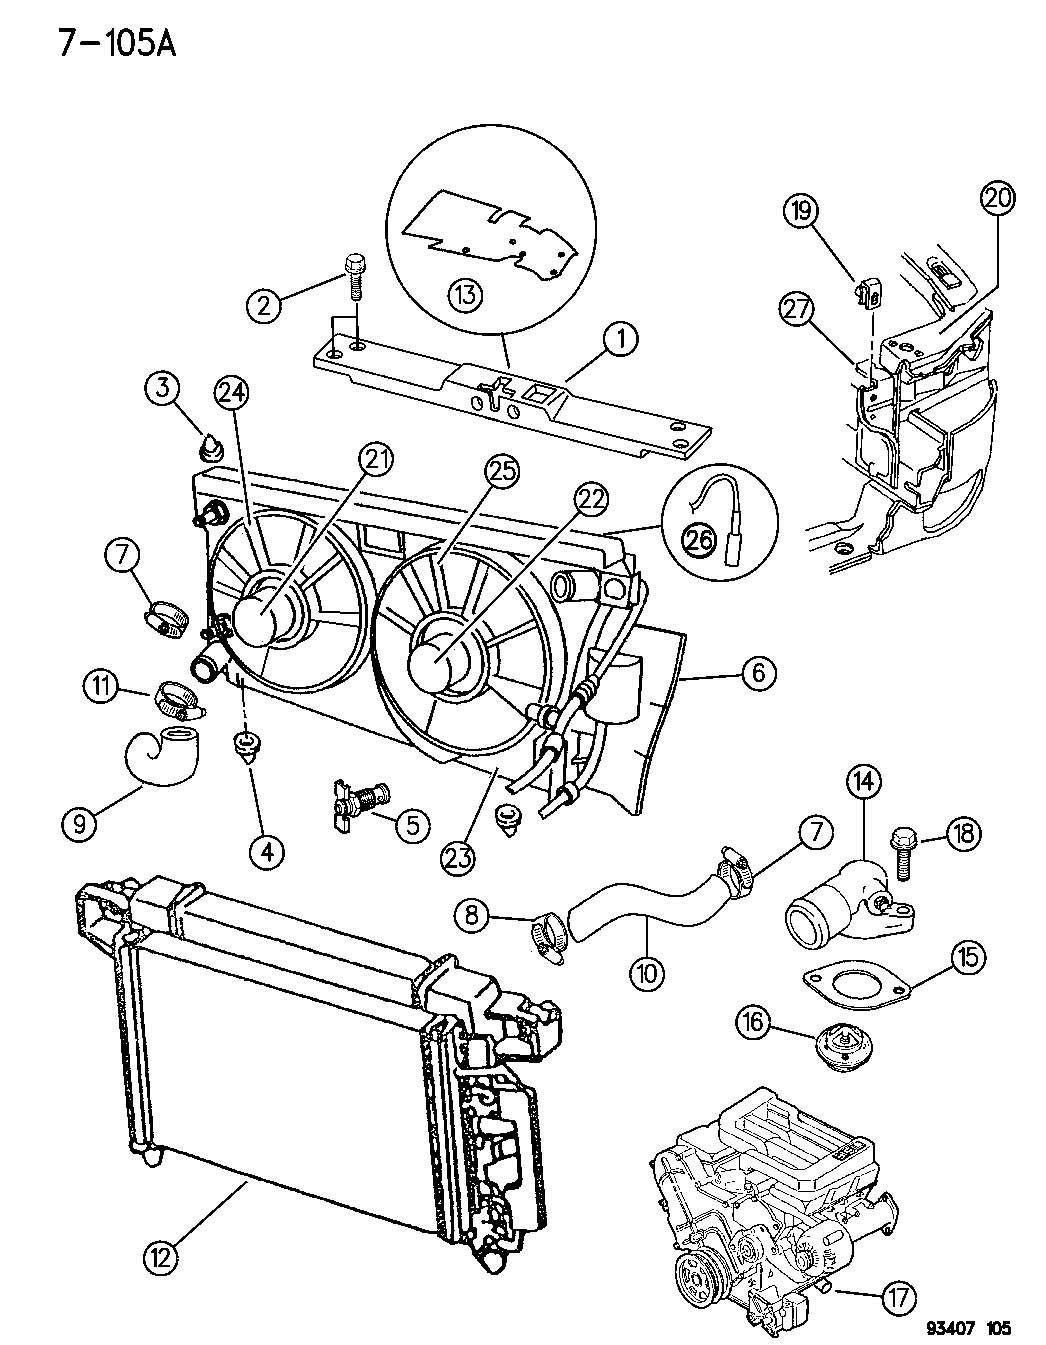 [DIAGRAM] 2000 Chrysler Concorde Radiator Fan Wiring